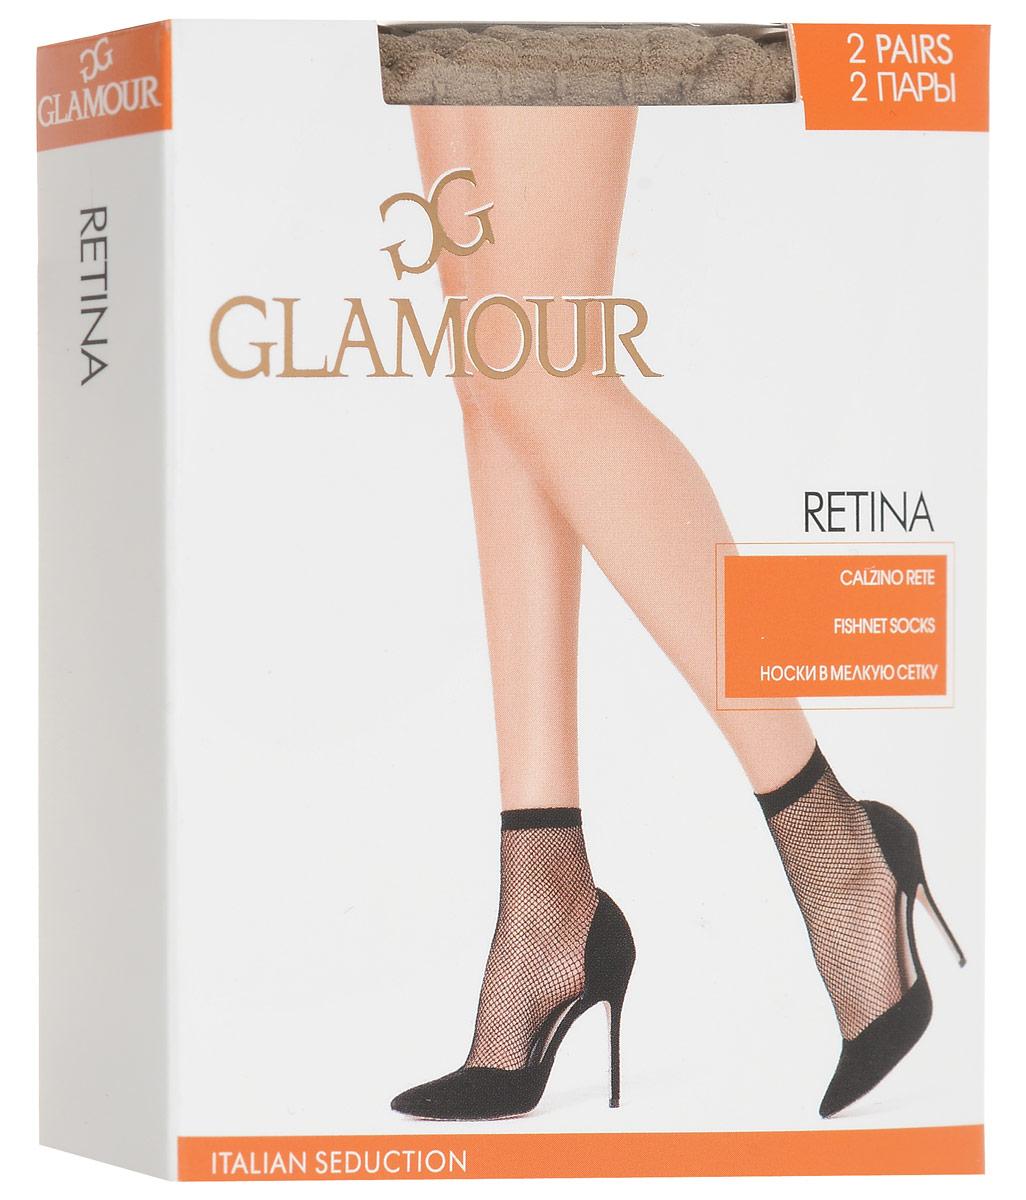 Glamour ����� ������� Retina, 2 ����